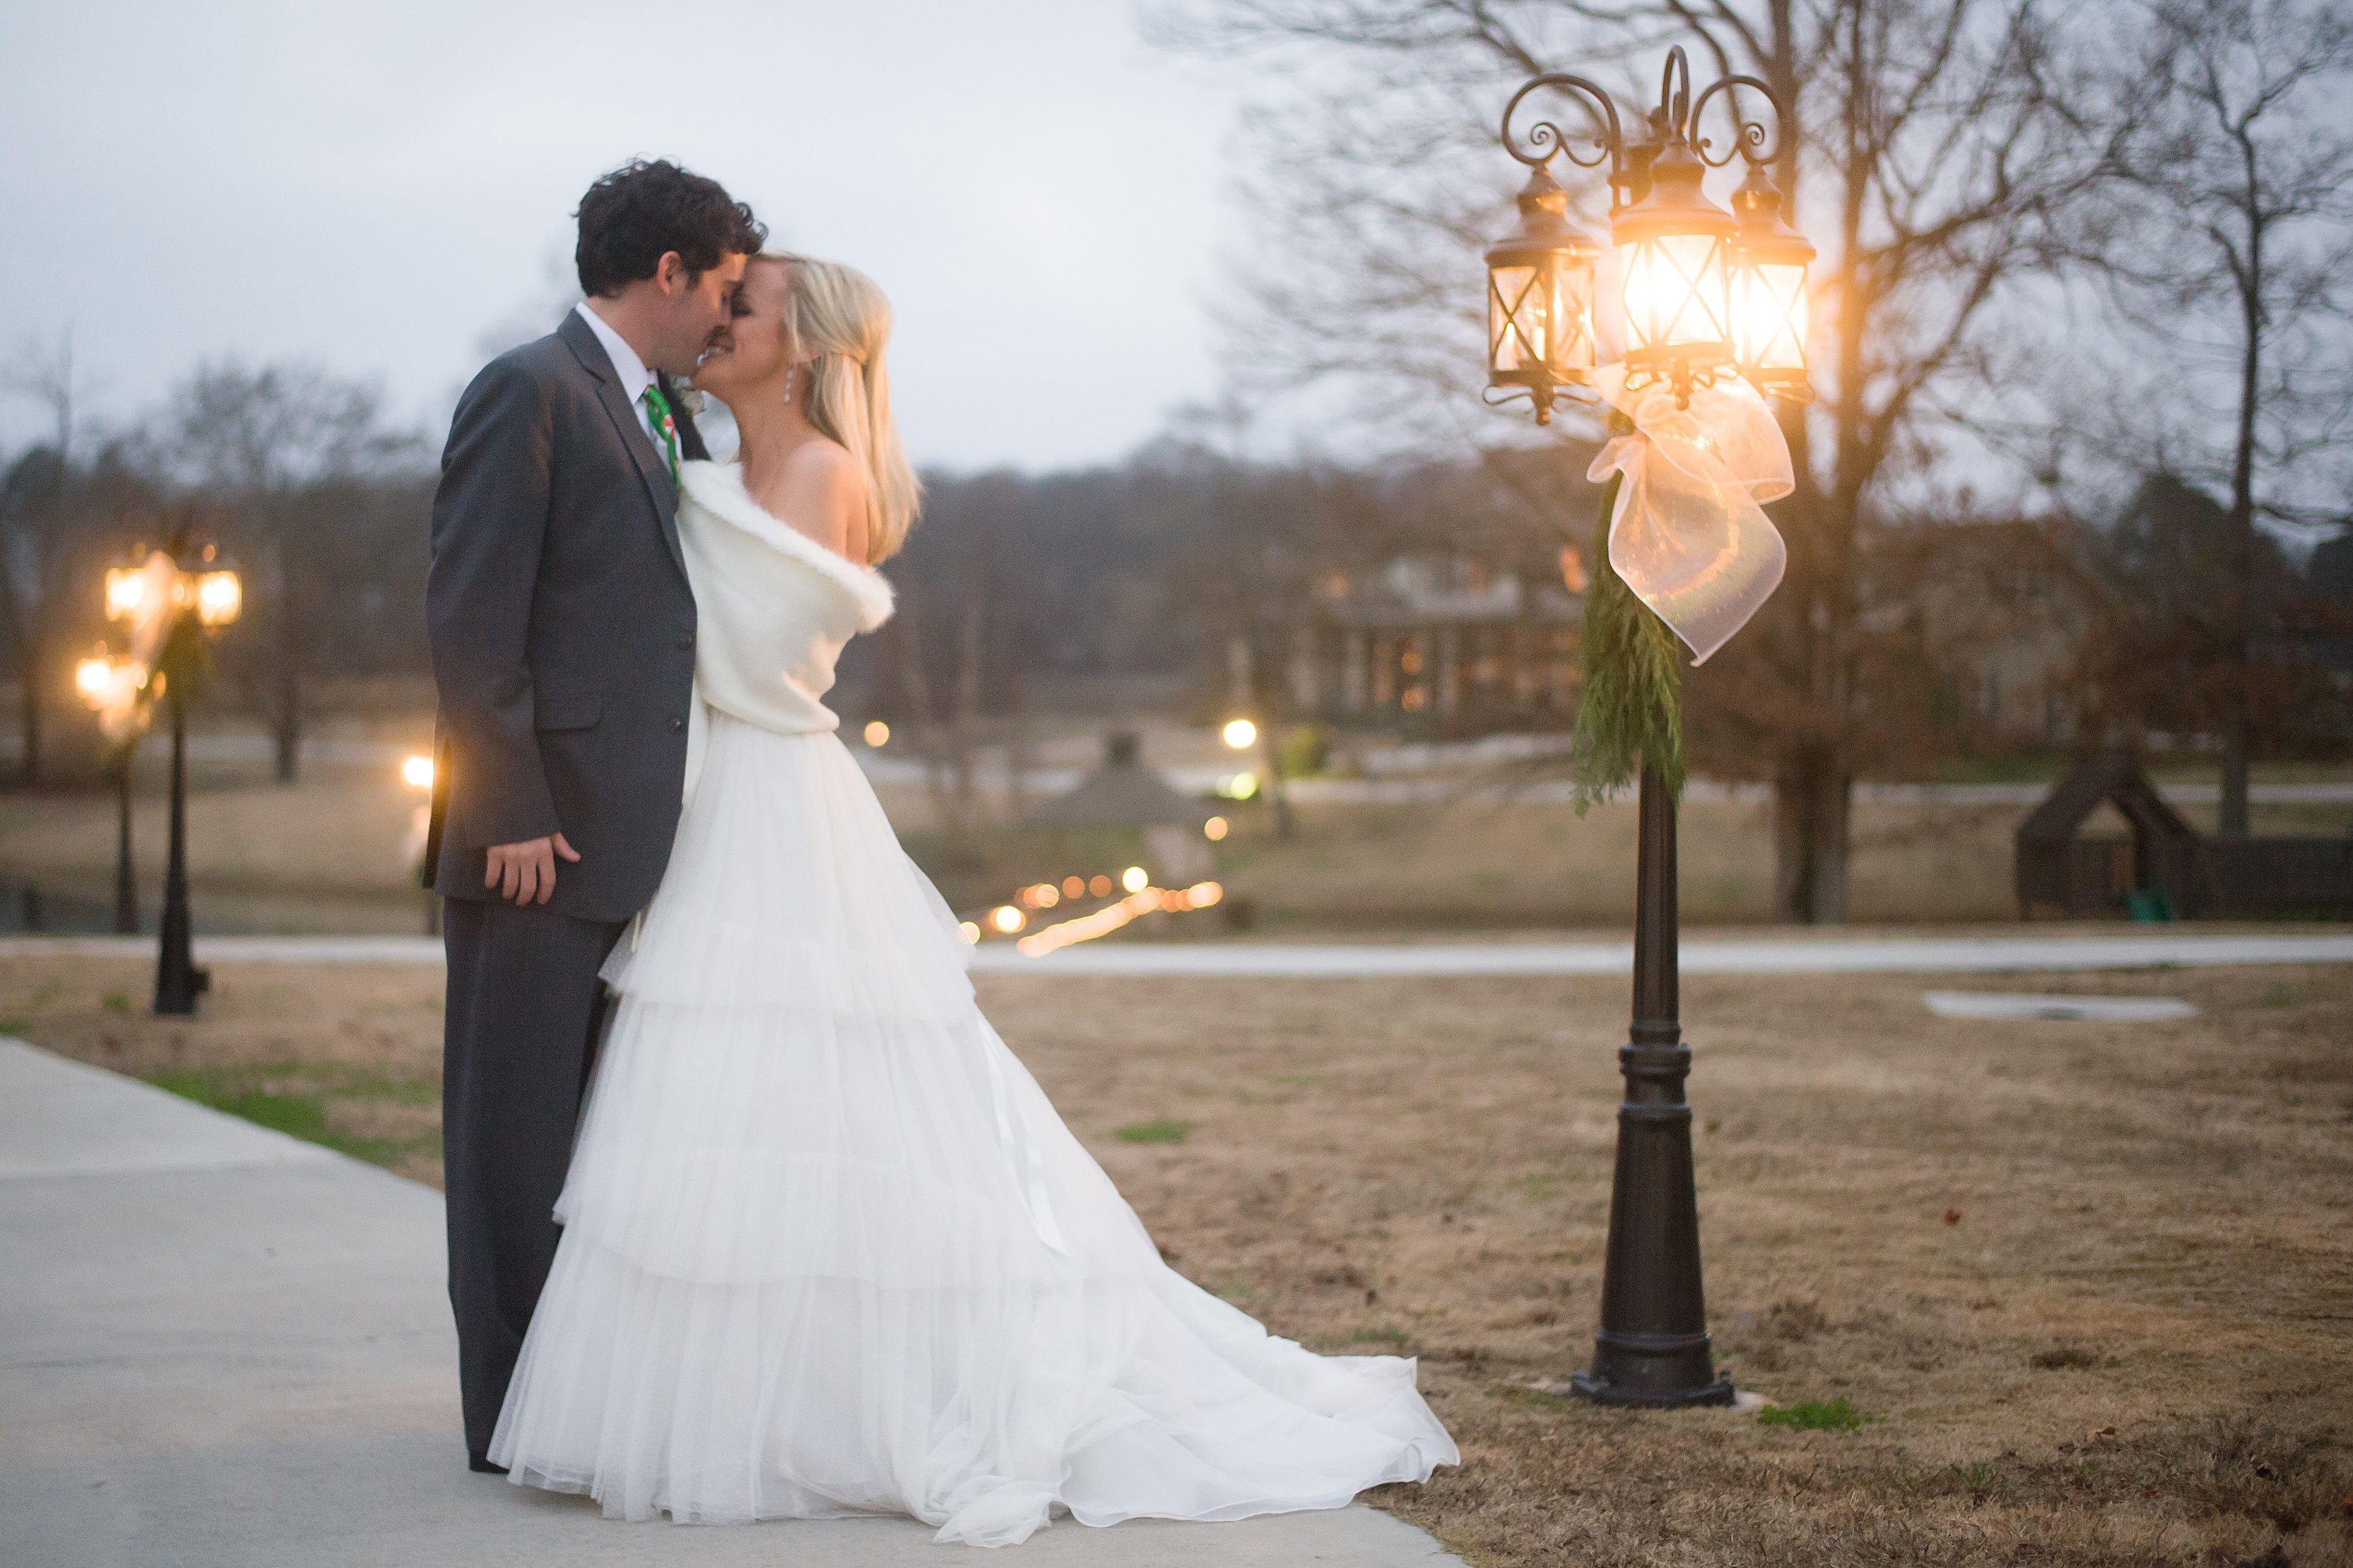 Wedding dress huntsville al  Modern Stone Bridge Farm Wedding  Simple colors Wedding and Weddings